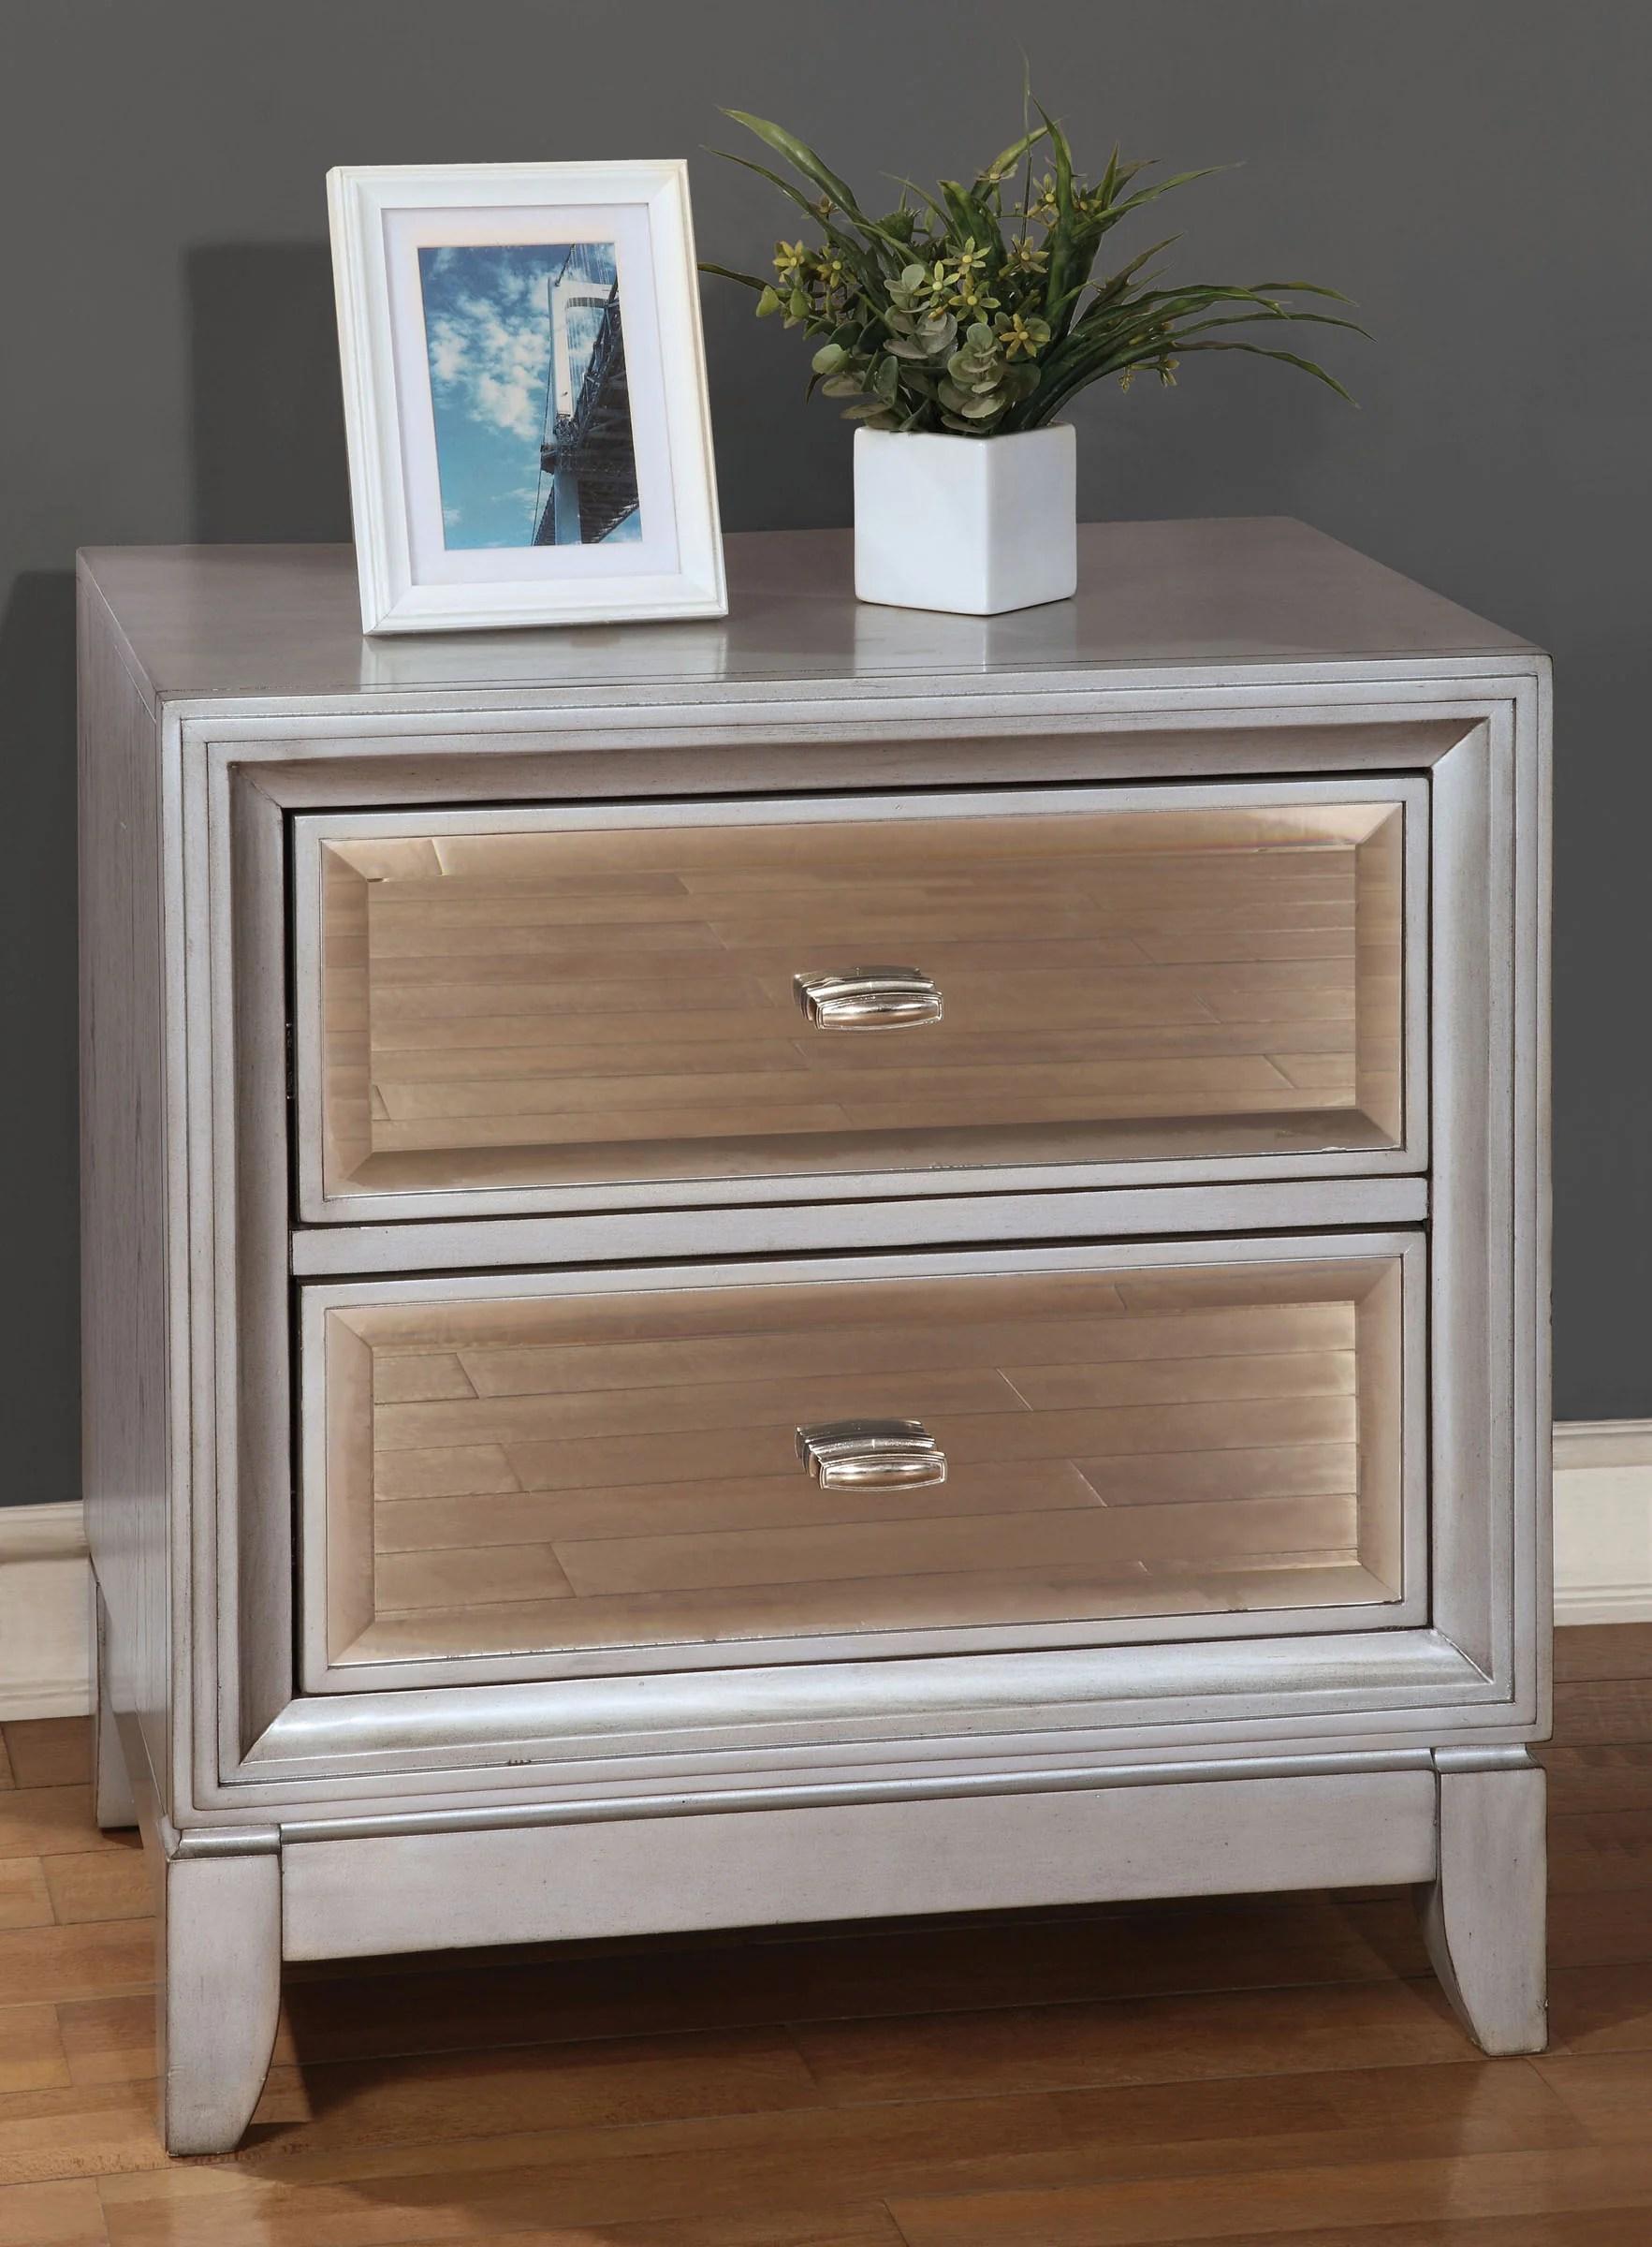 Furniture Of America Cm7295sv N Golva Silver Mirrored Nightstand